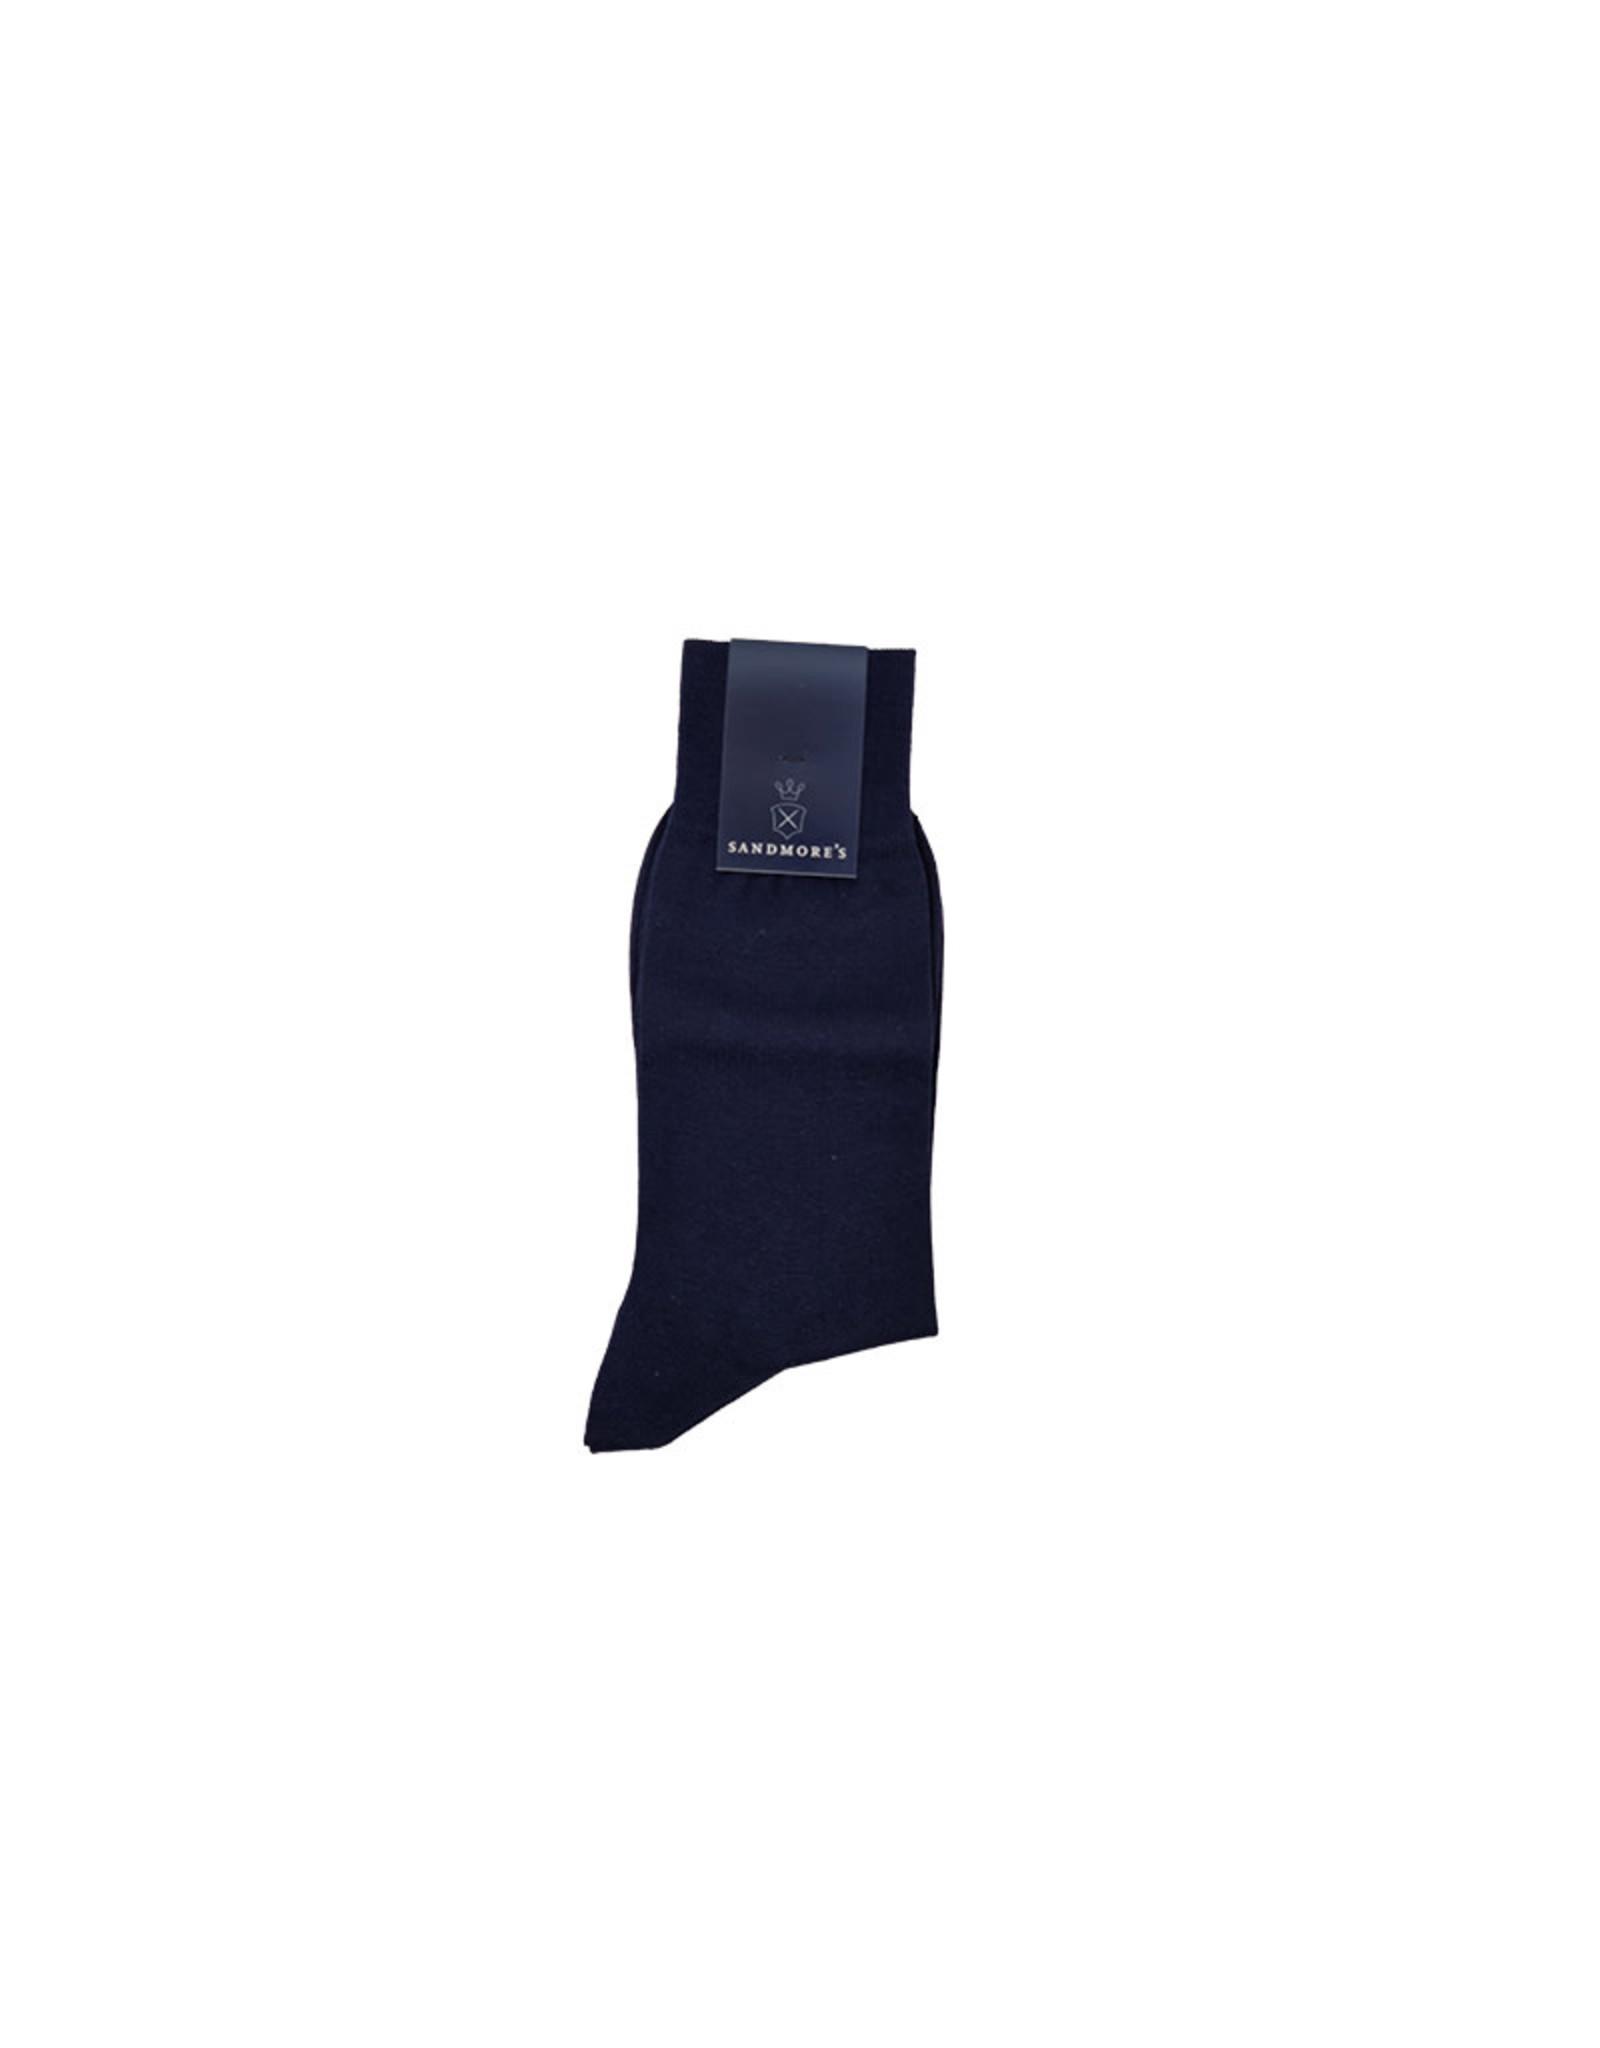 Russo Italia Sandmore's sokken katoen blauw M431